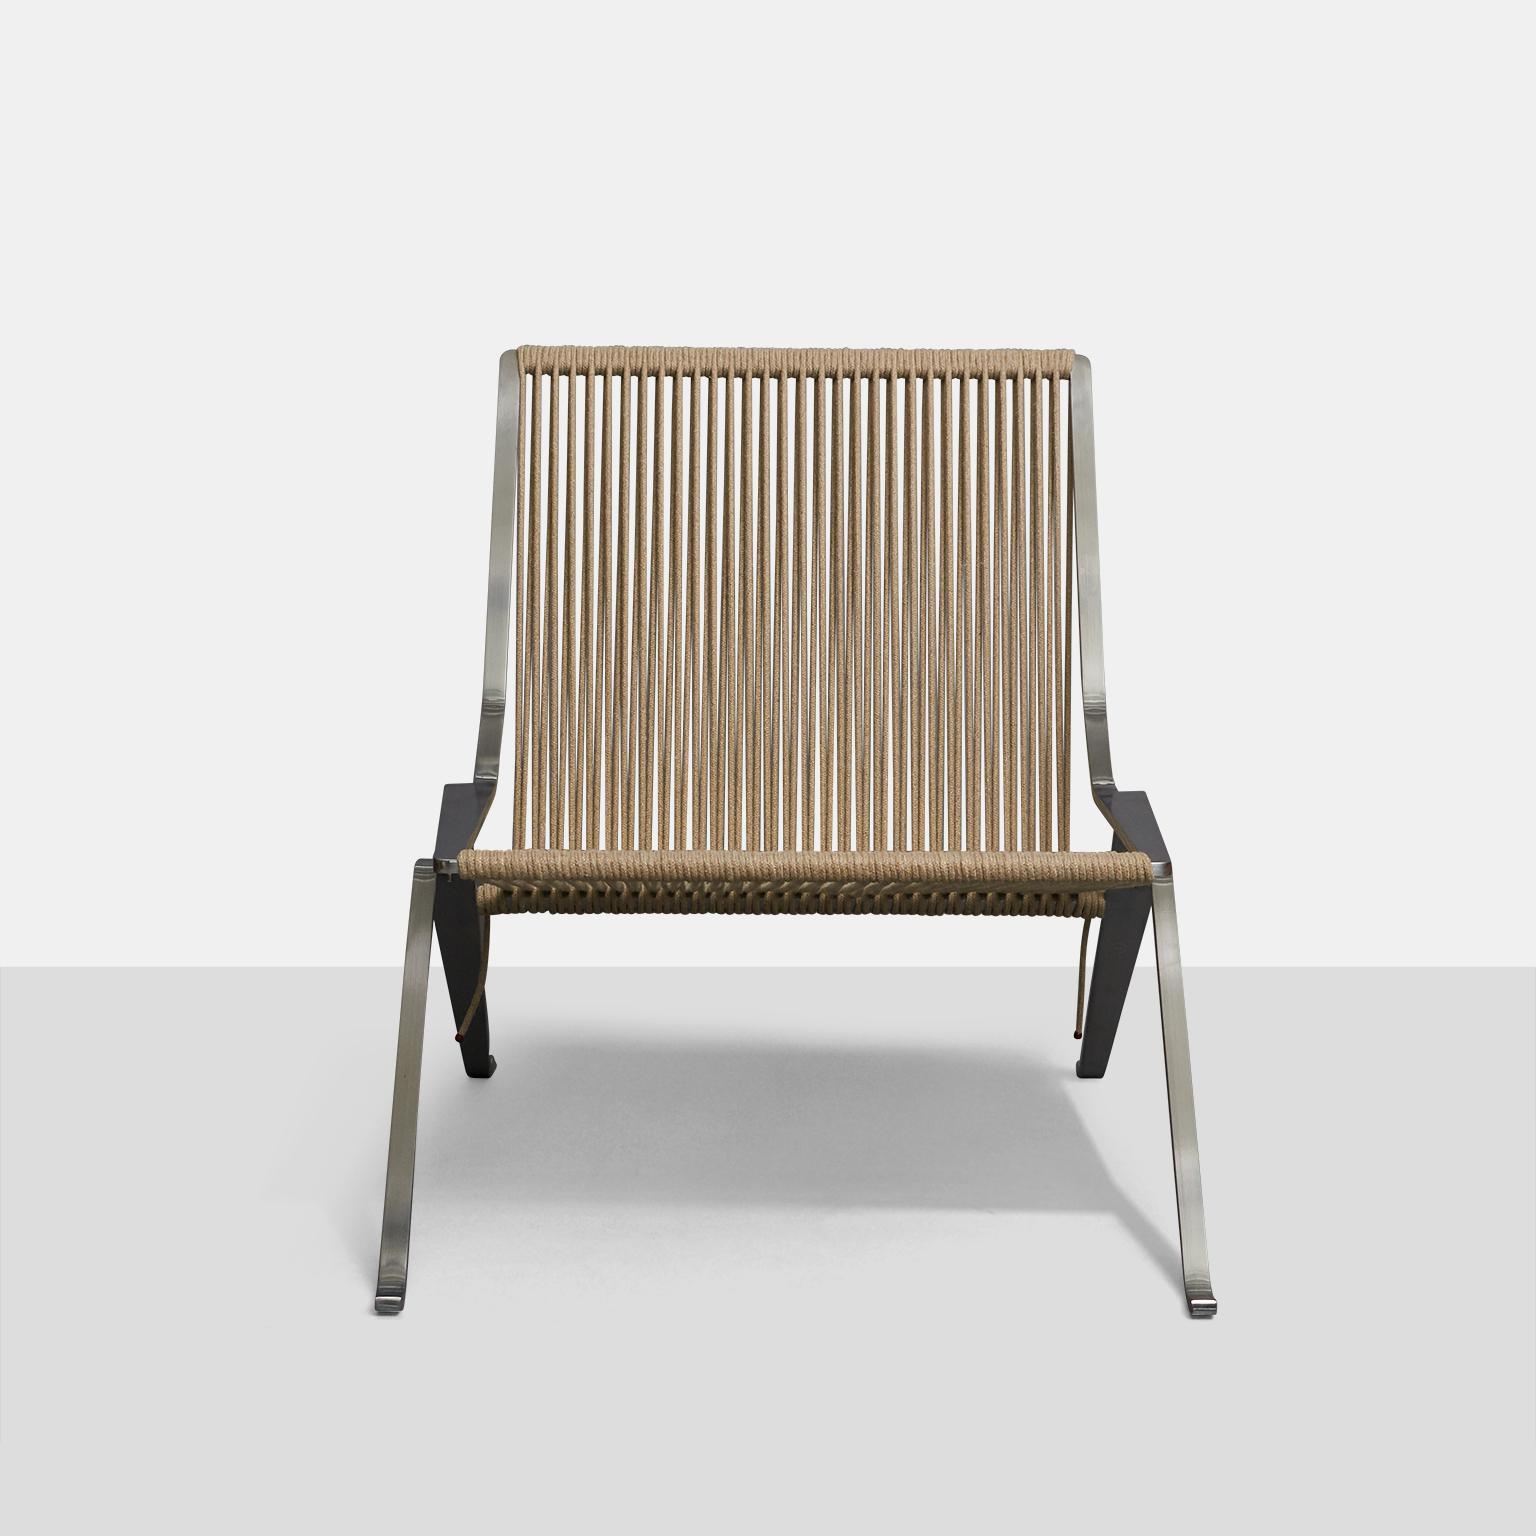 poul kjaerholm furniture. poul kjaerholm pk25 lounge chair image 6 of furniture e